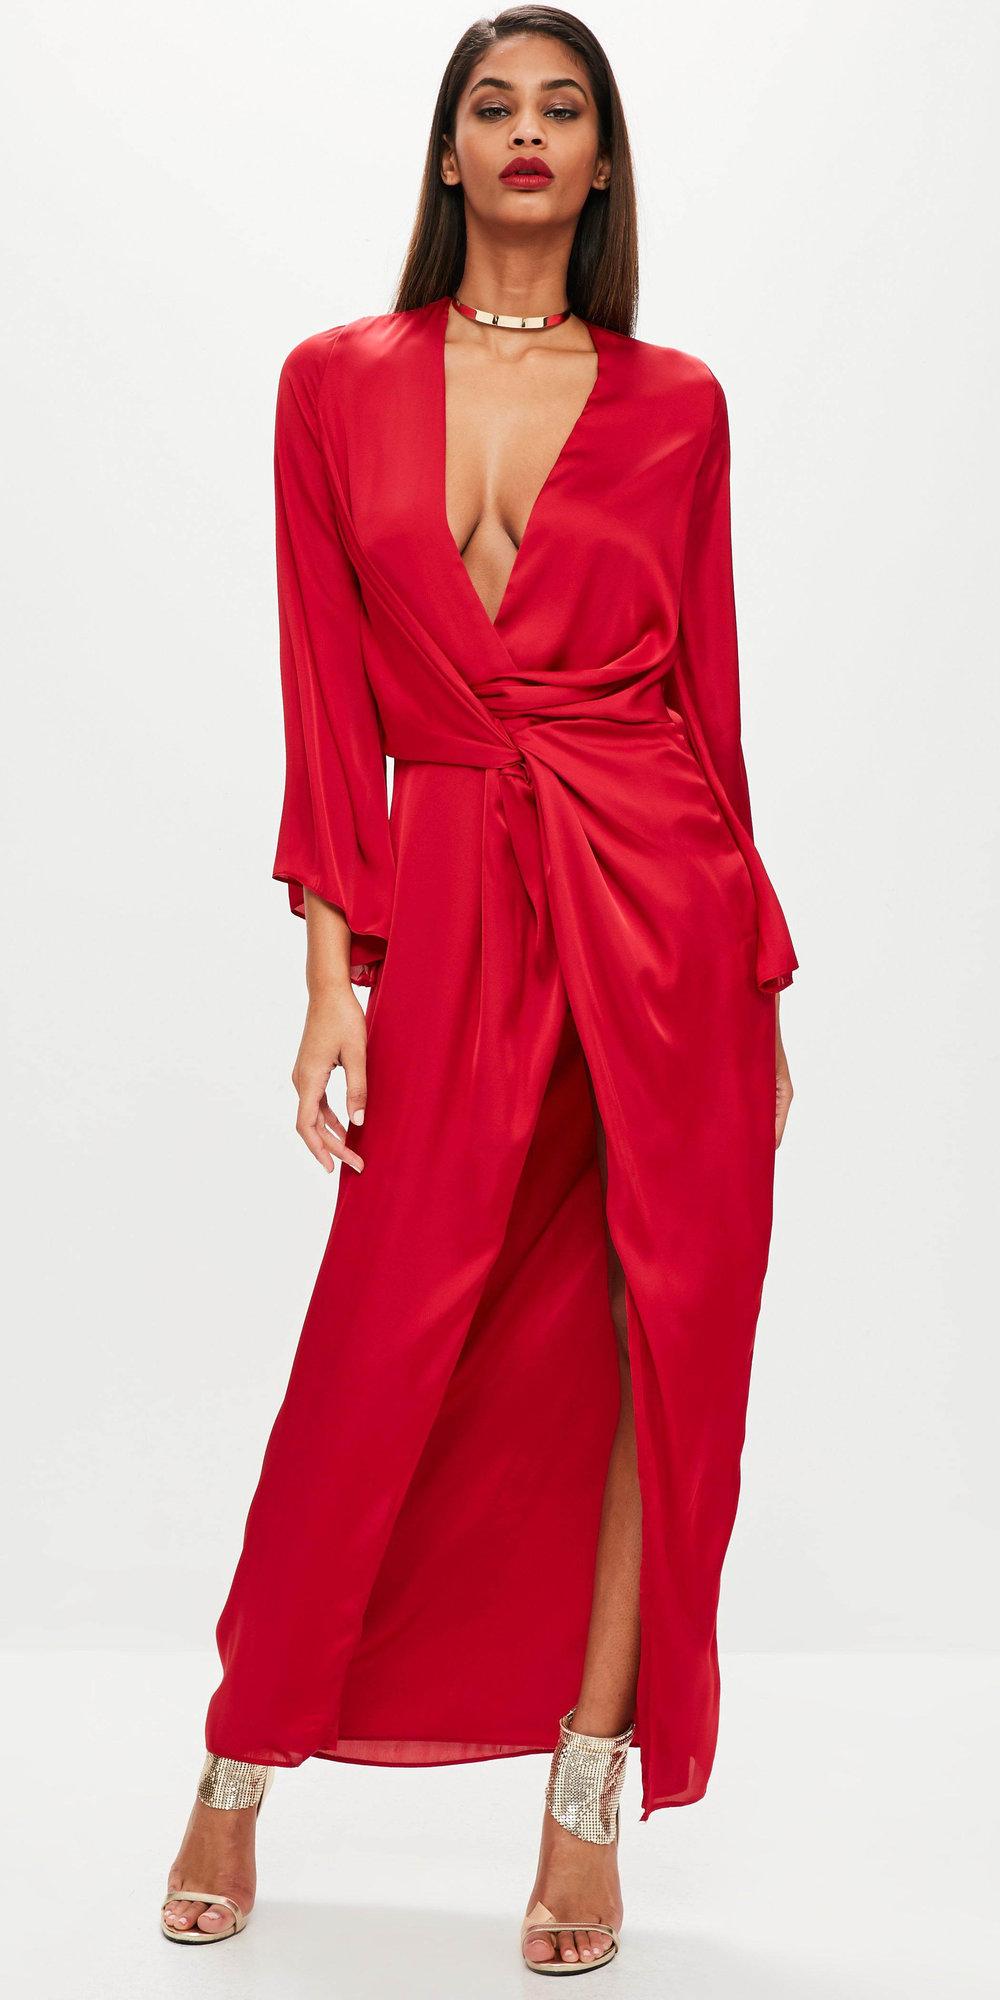 95506695b42 red-dress-maxi-wrap-tan-shoe-sandalh-collar-